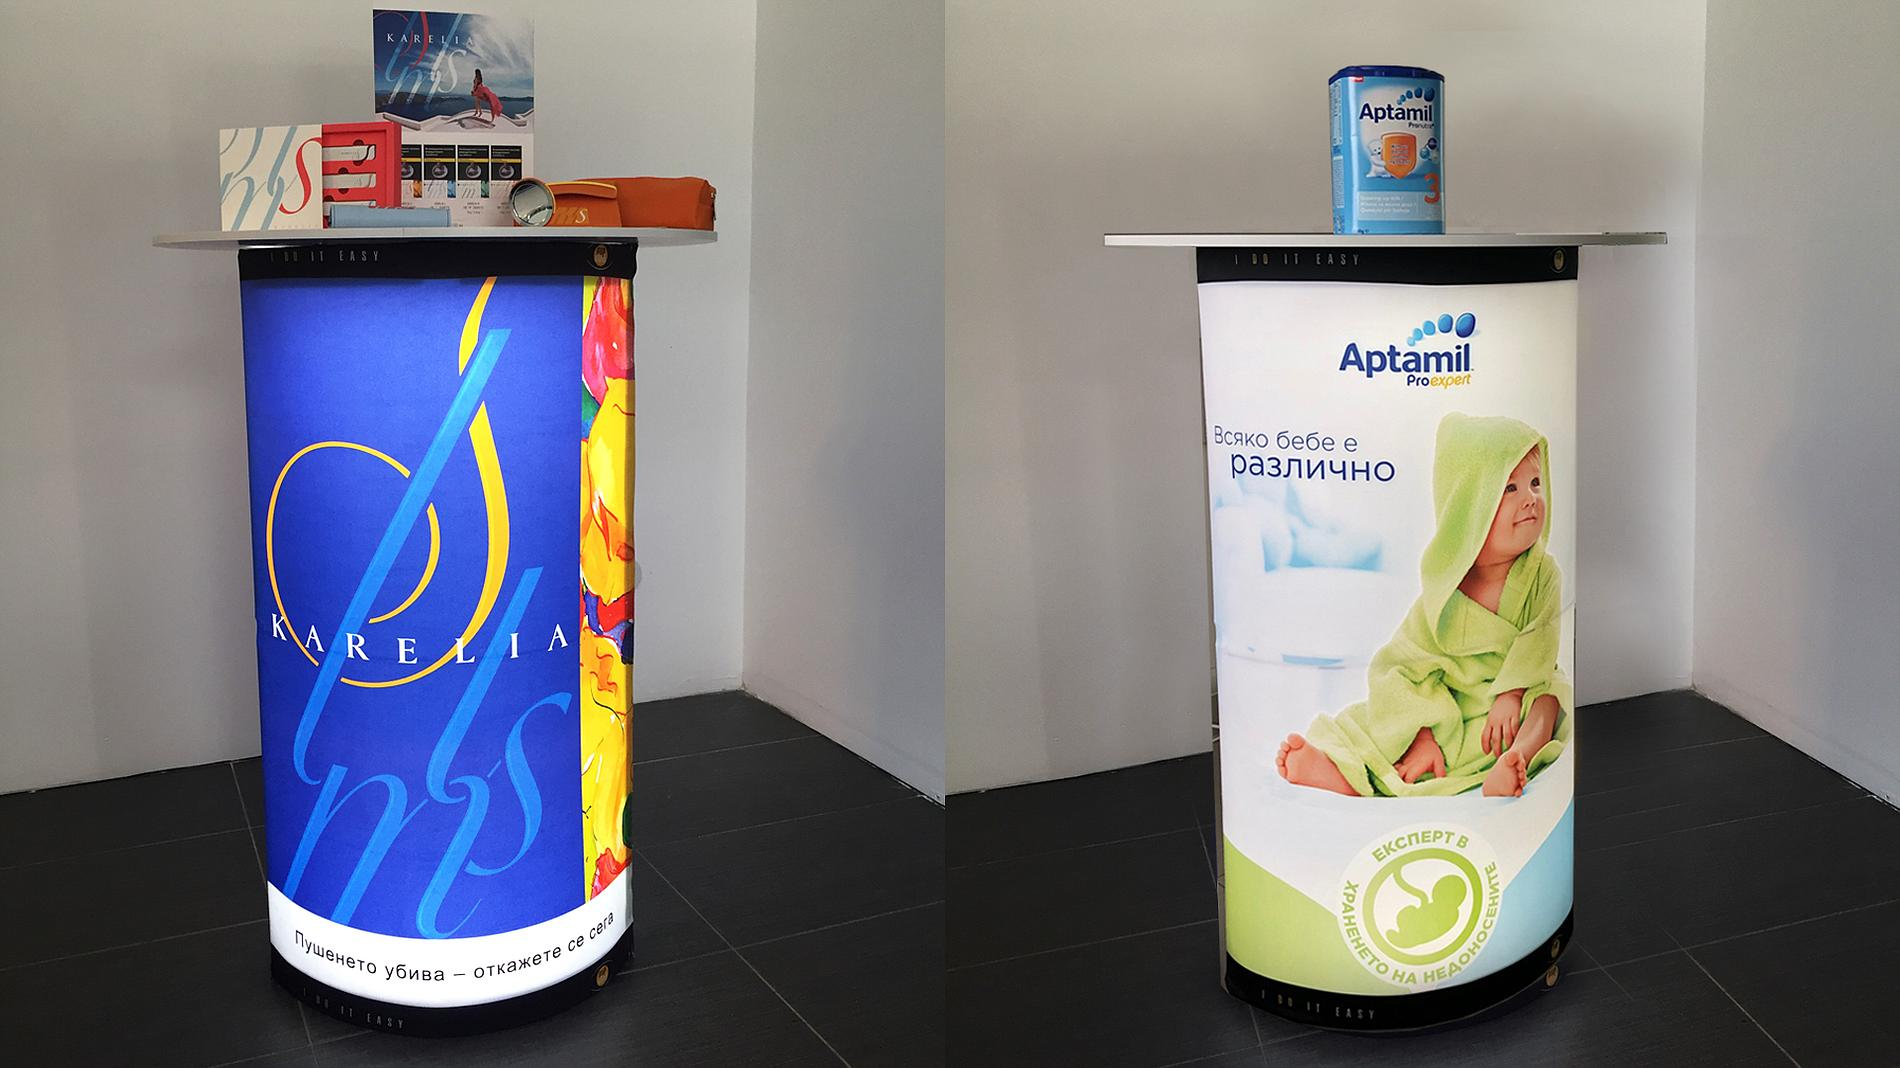 illuminated, portable counter display